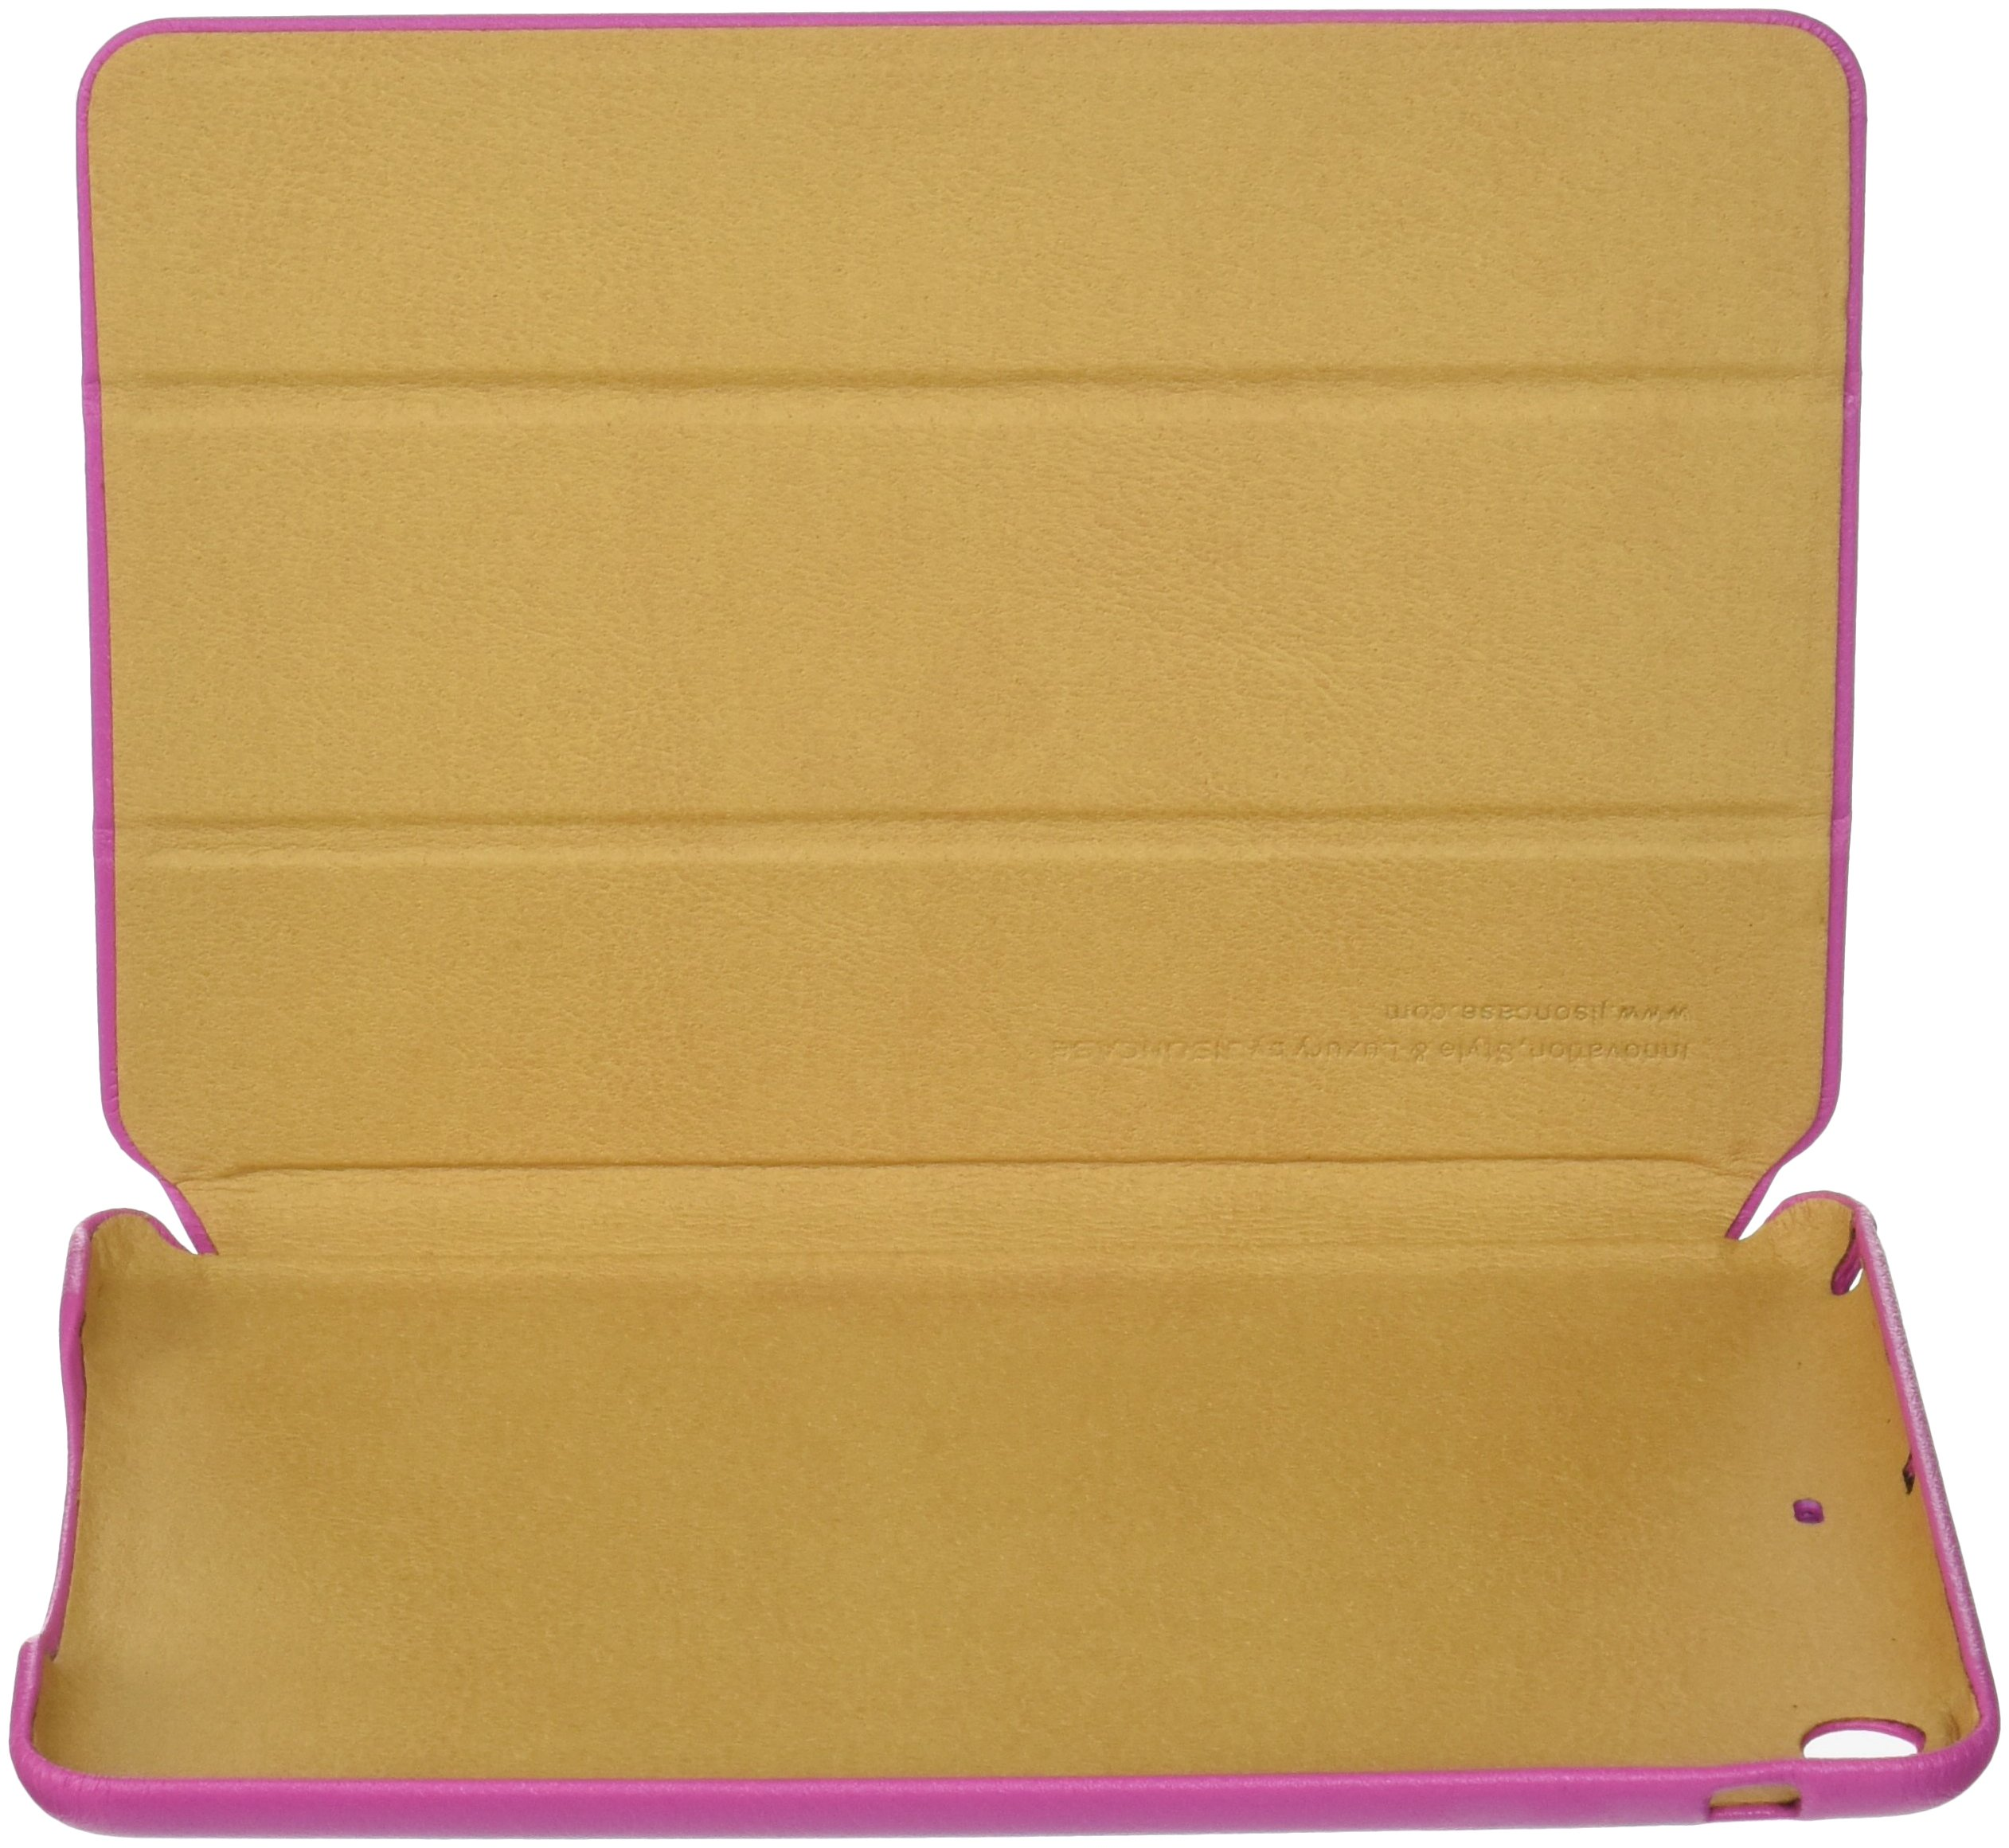 Jisoncase Classic Premium Leatherette Smart Cover Case for iPad mini JS-IM-001-Rose